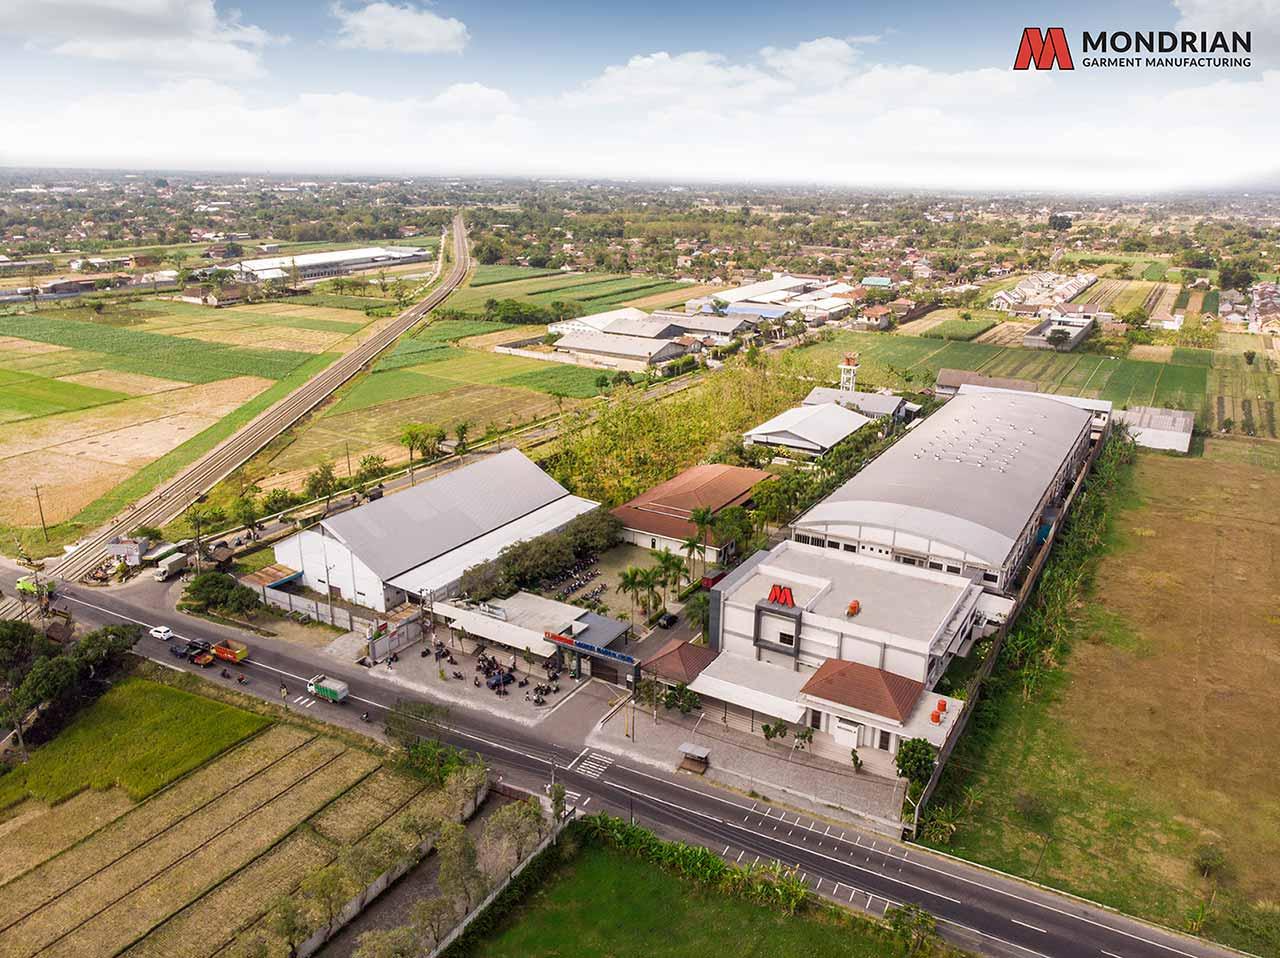 pt-mondrian-aerial-view